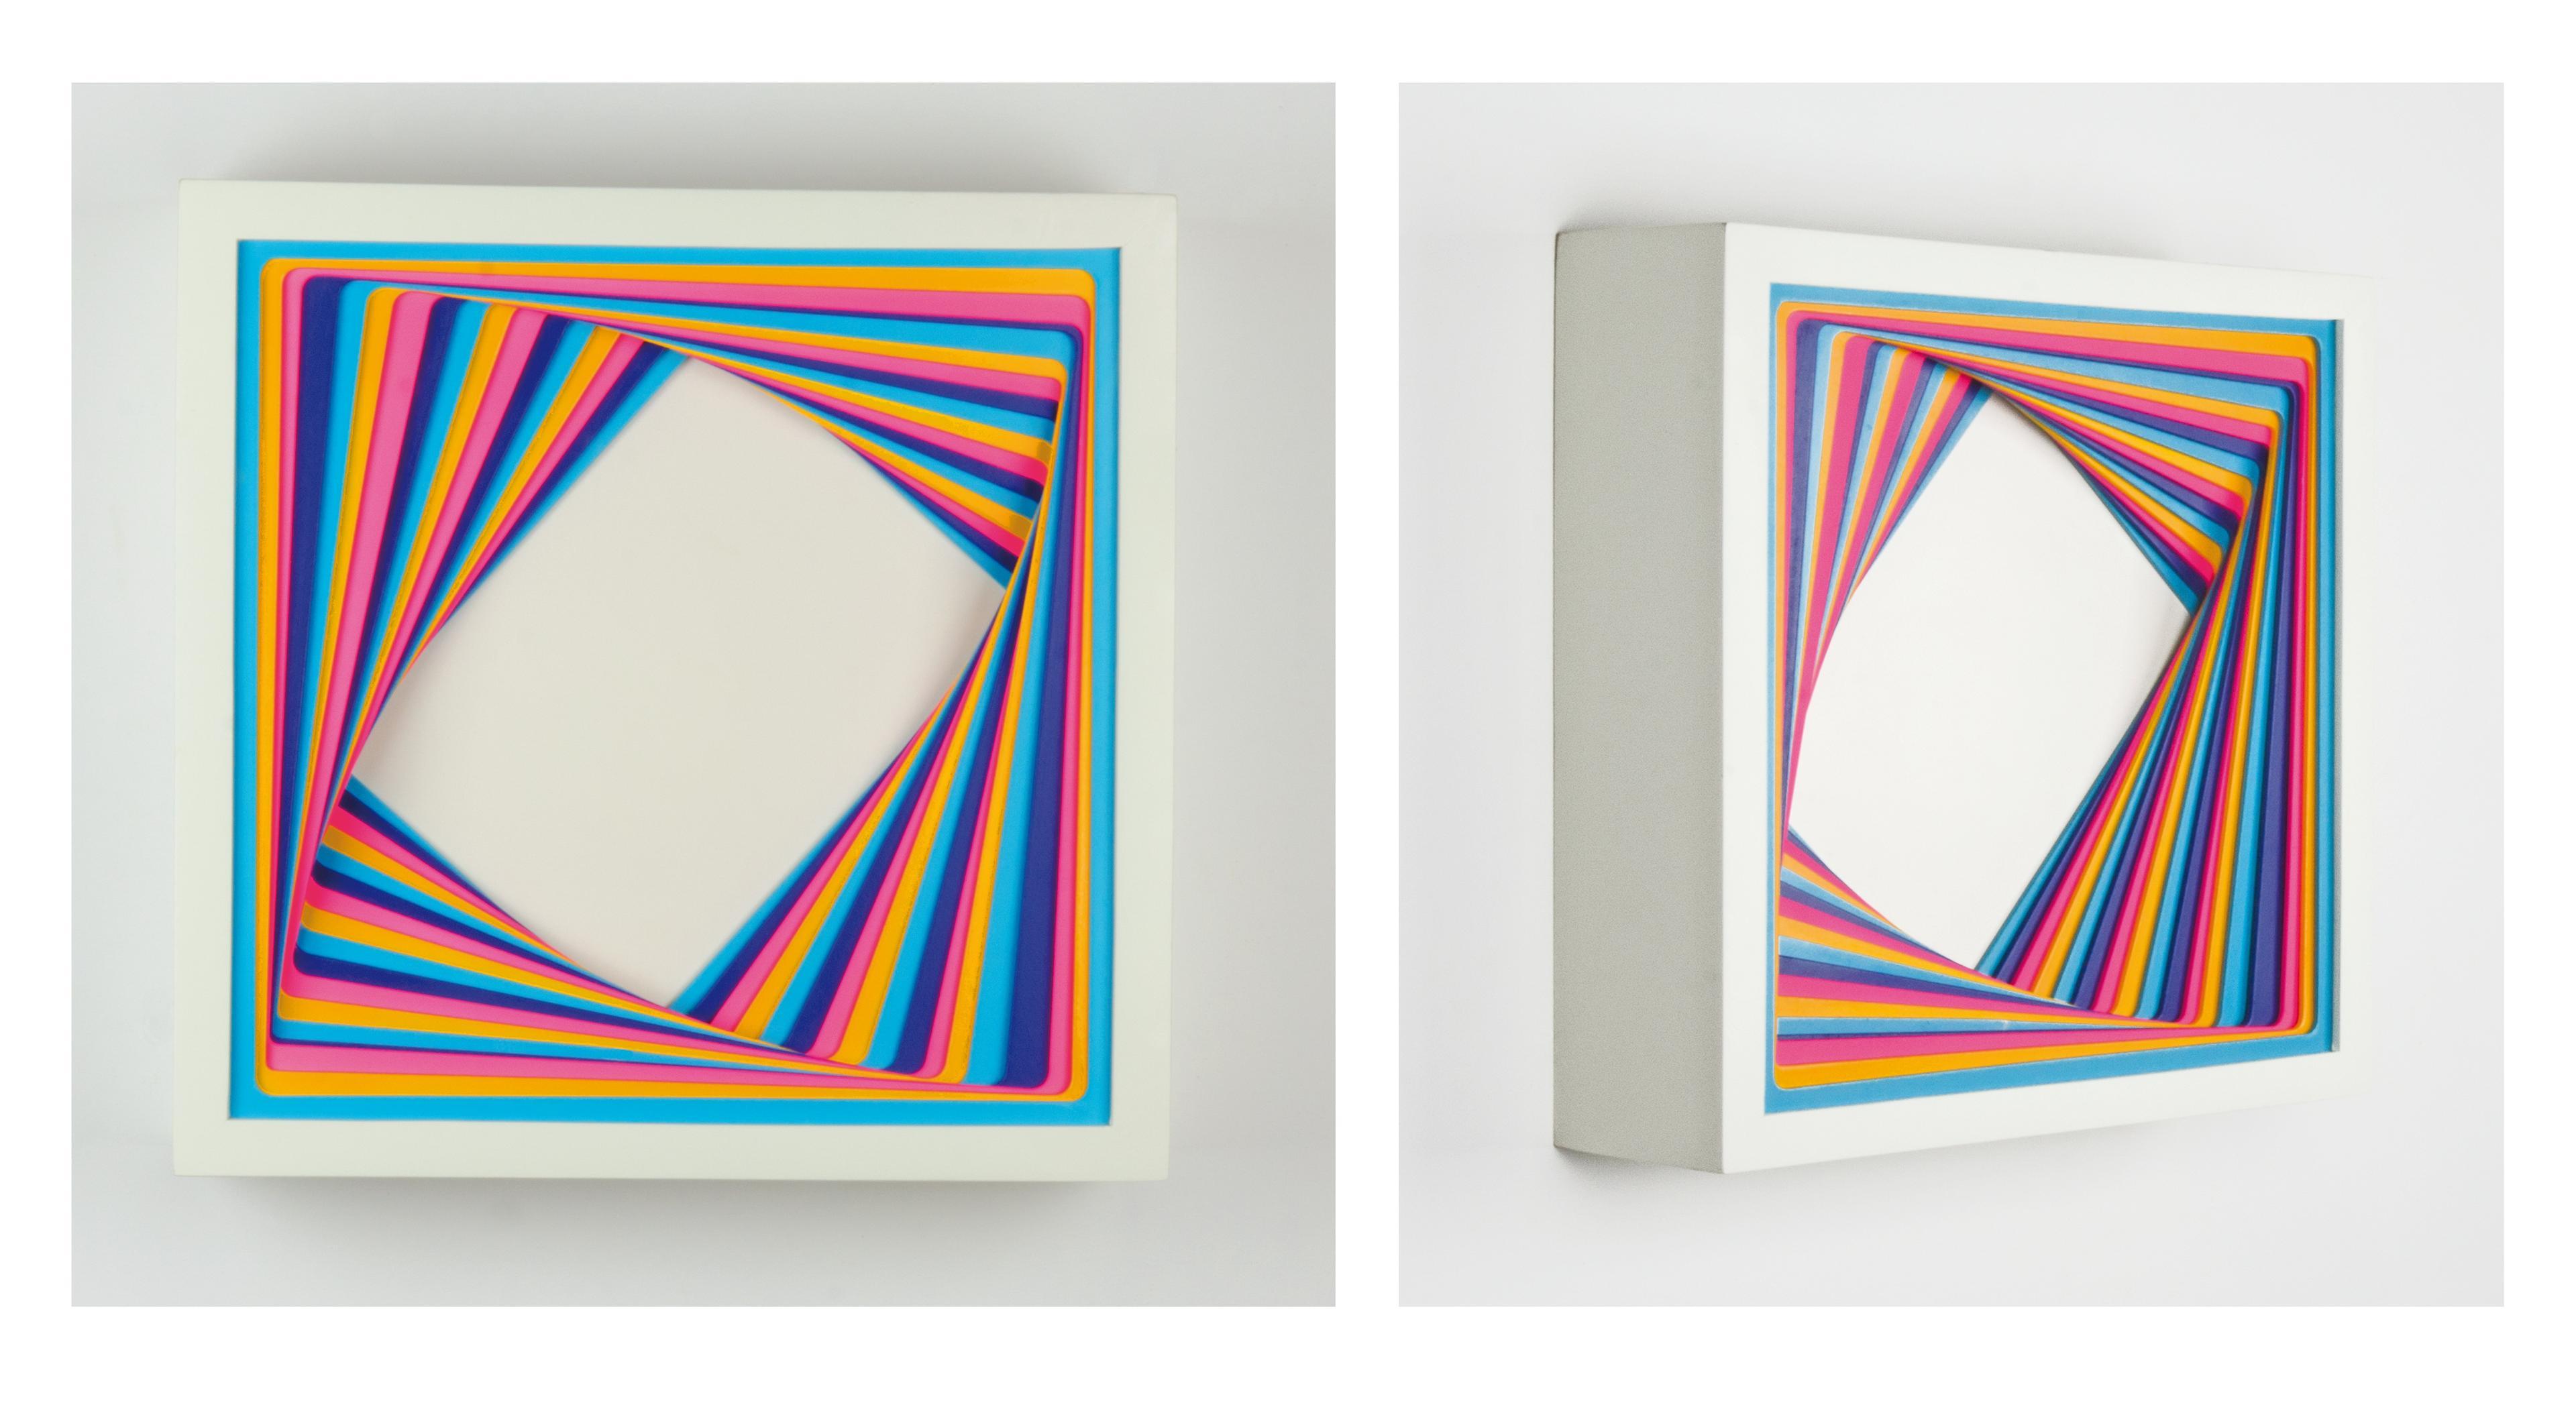 artwork frame-module-box by Daniel Engelberg